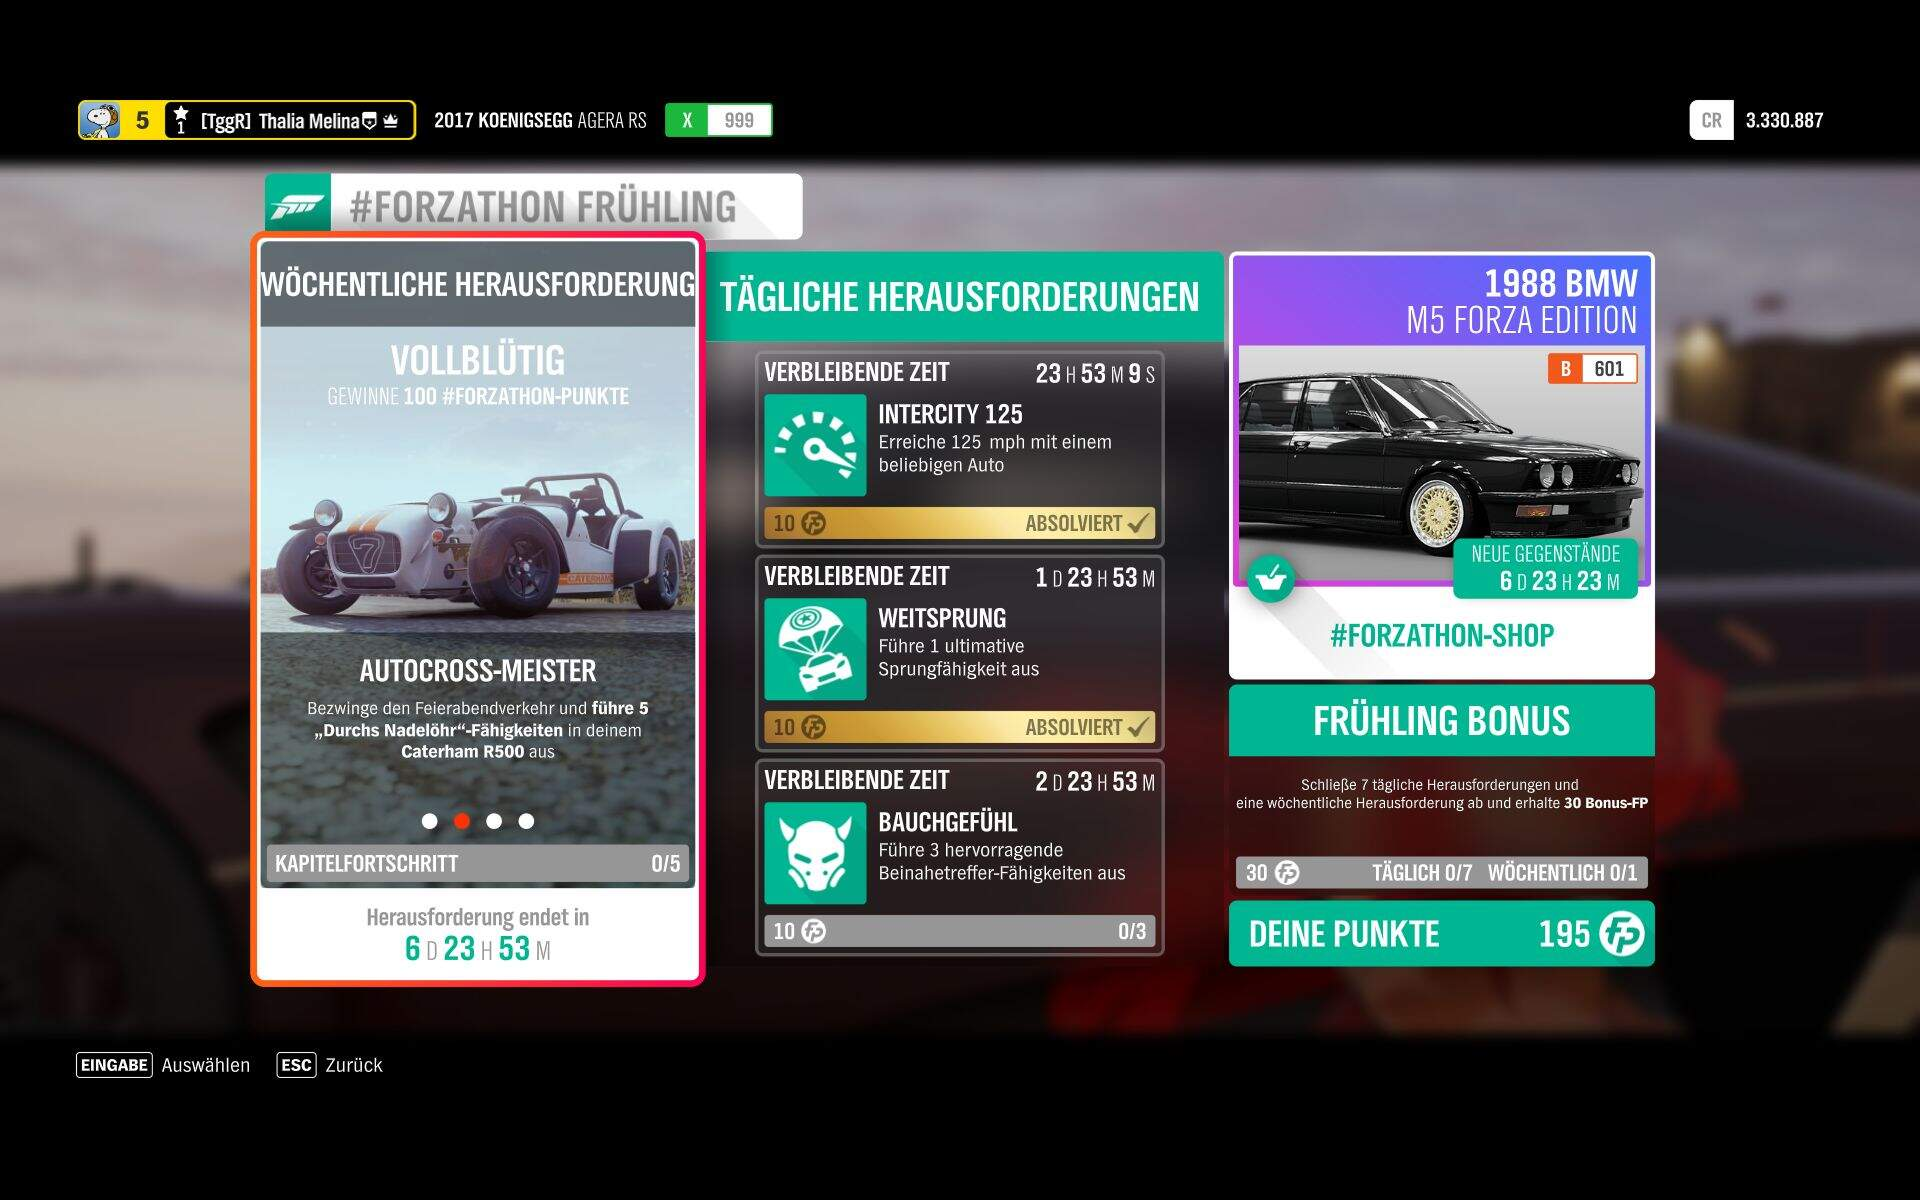 Forza Horizon 4 #Forzathon KW 46 – Vollblütig Aufgabe 2